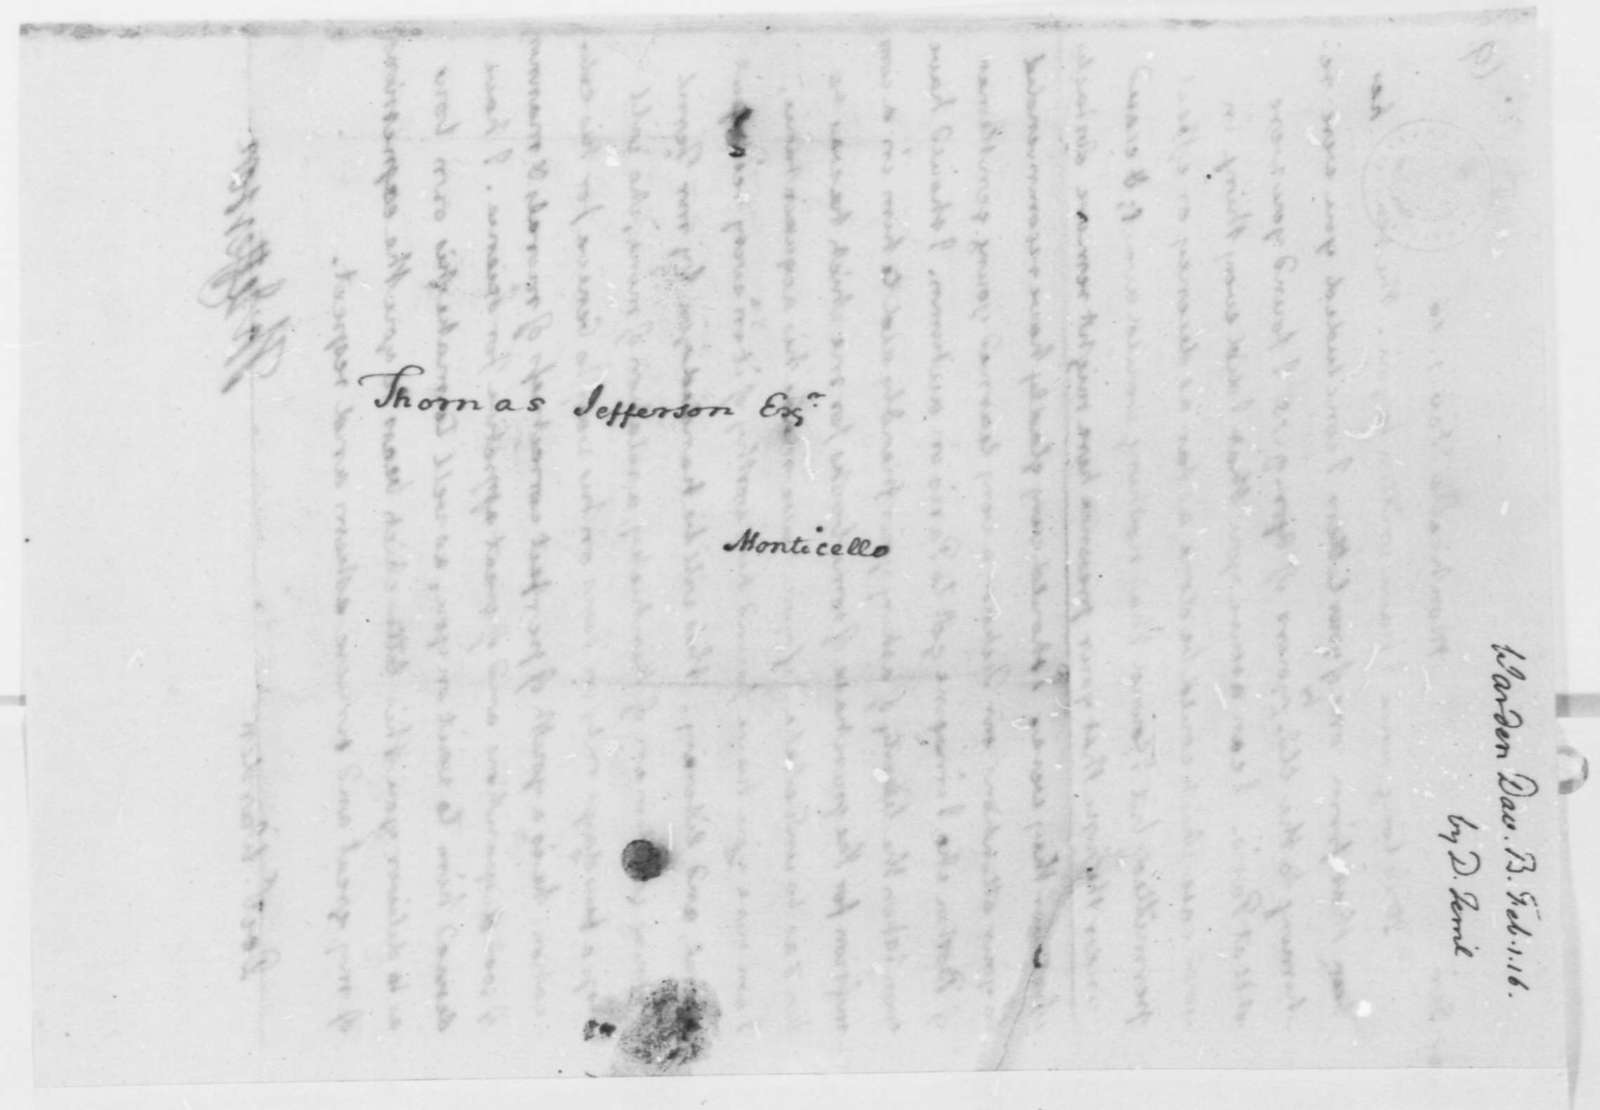 Thomas Jefferson to David B. Warden, February 1, 1816